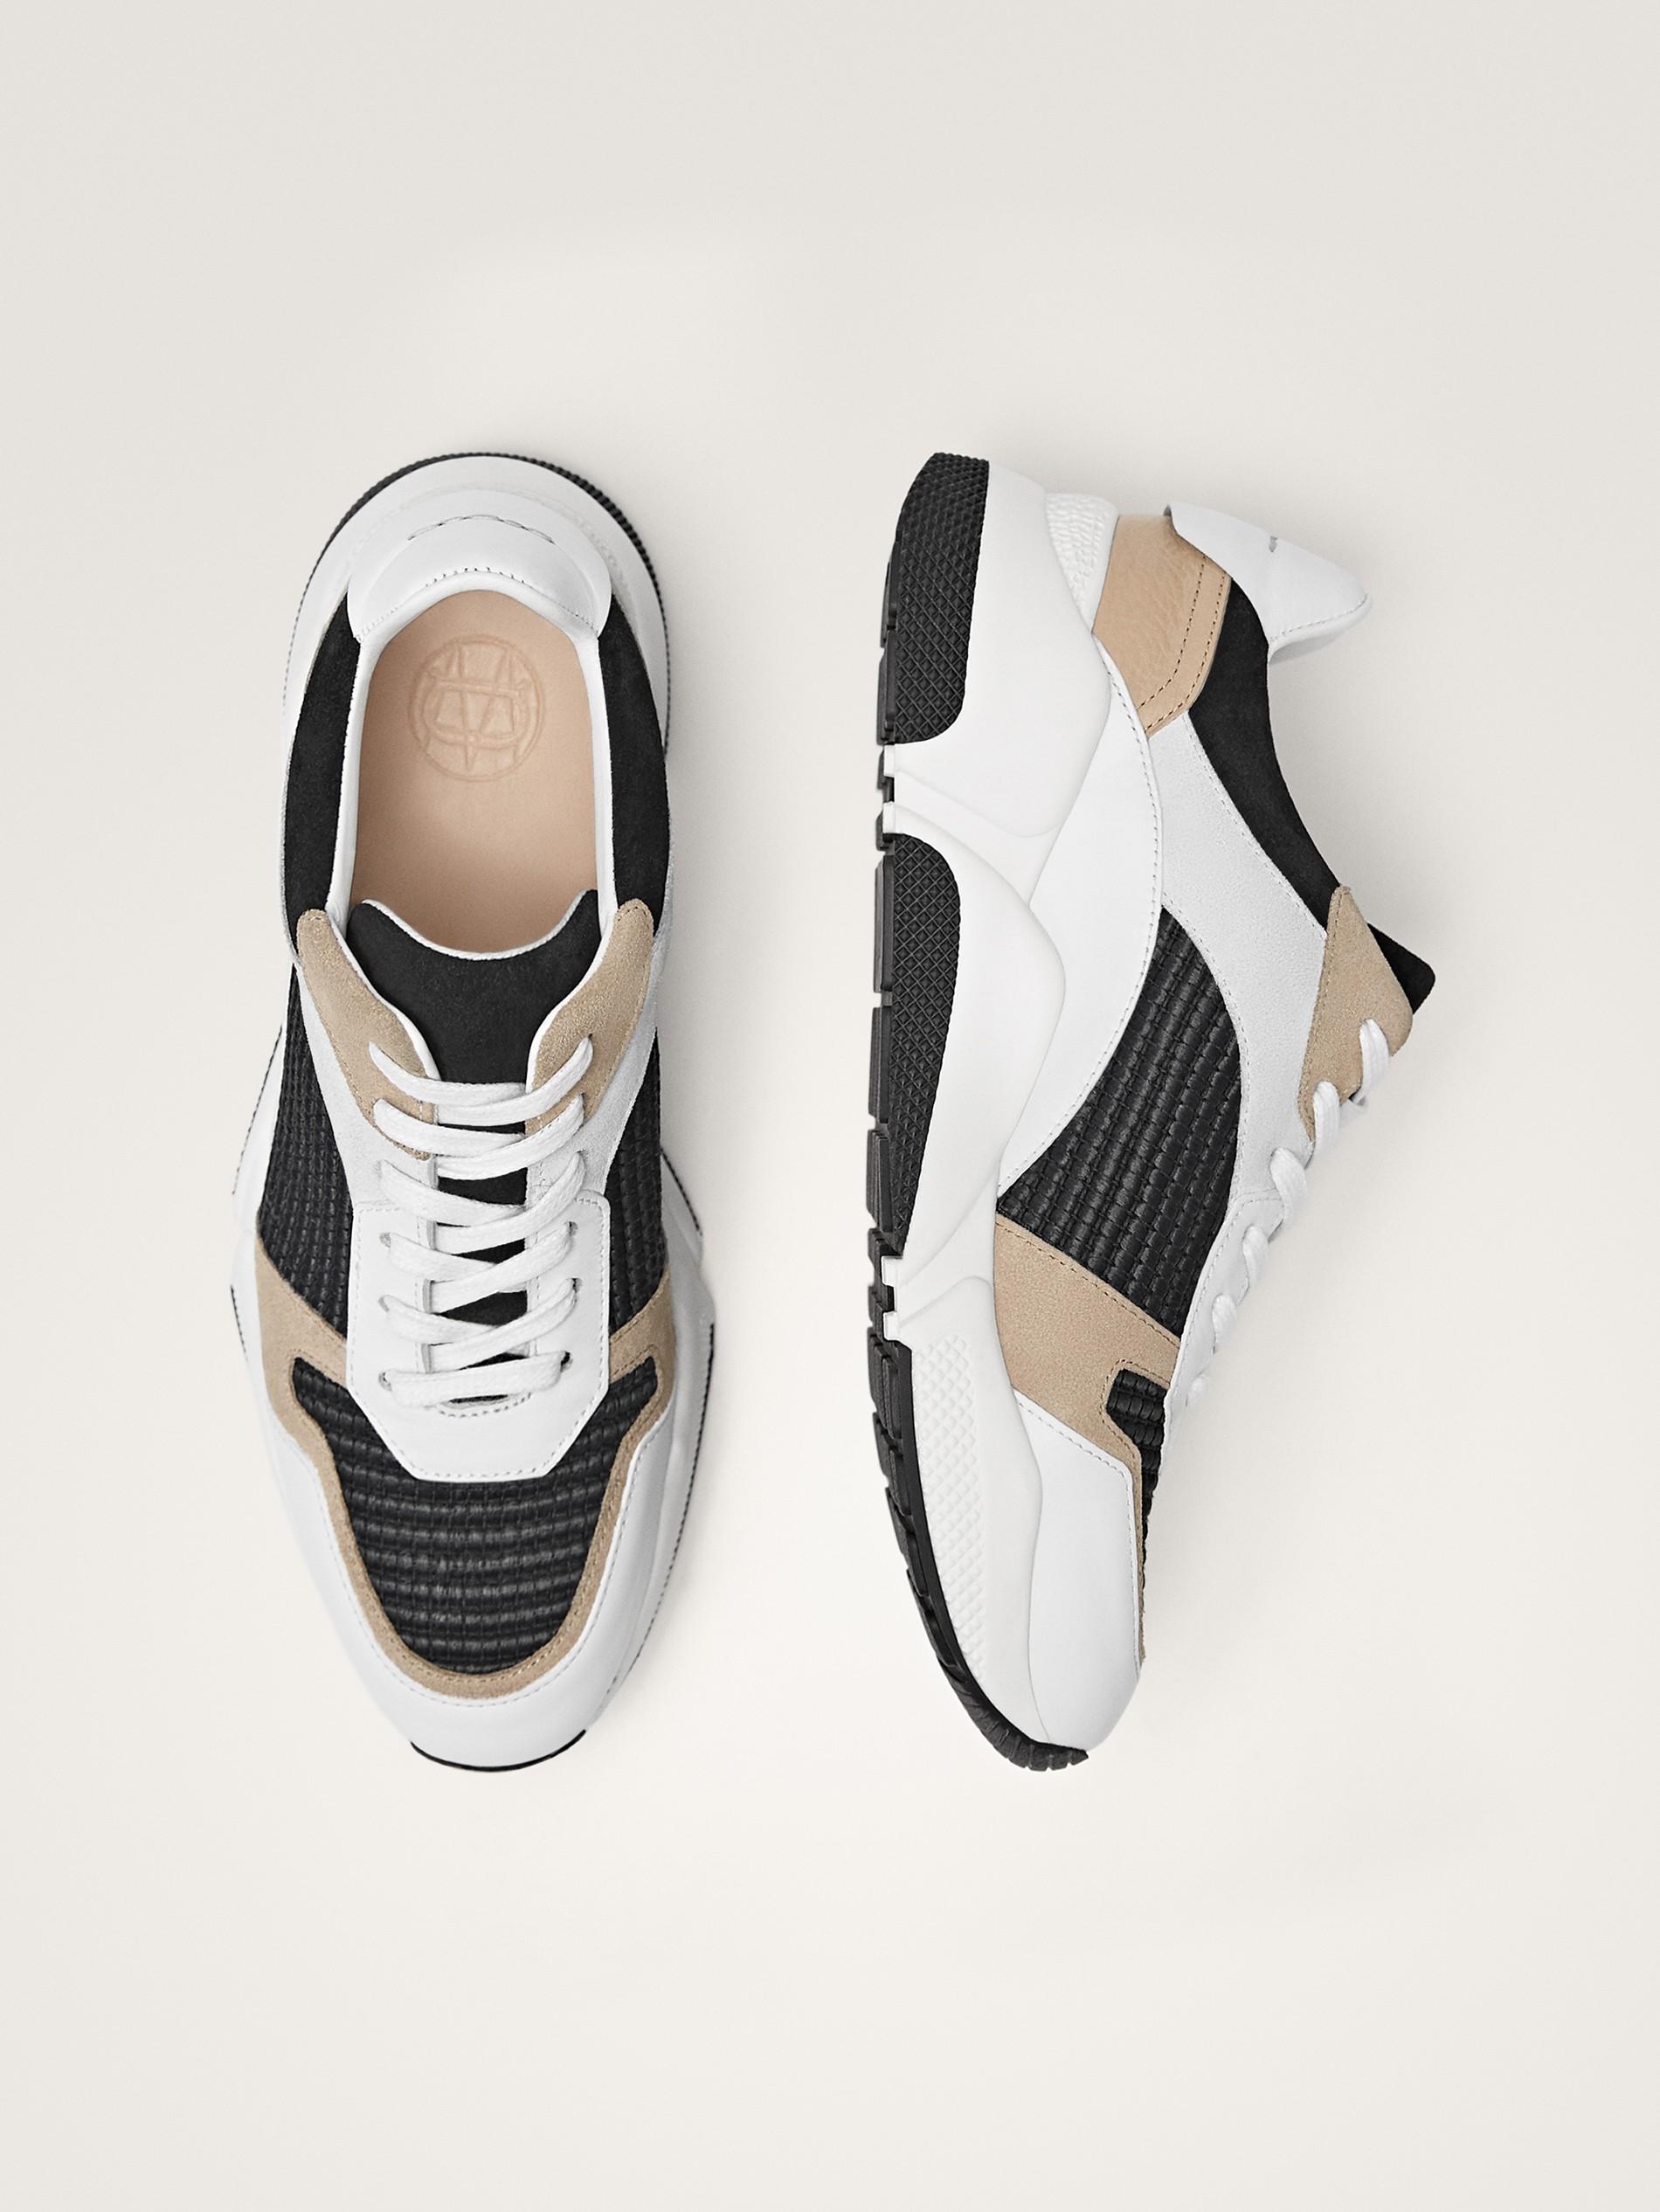 Contrast Massimo Dutti Women Sneakers Black UMpqSzV